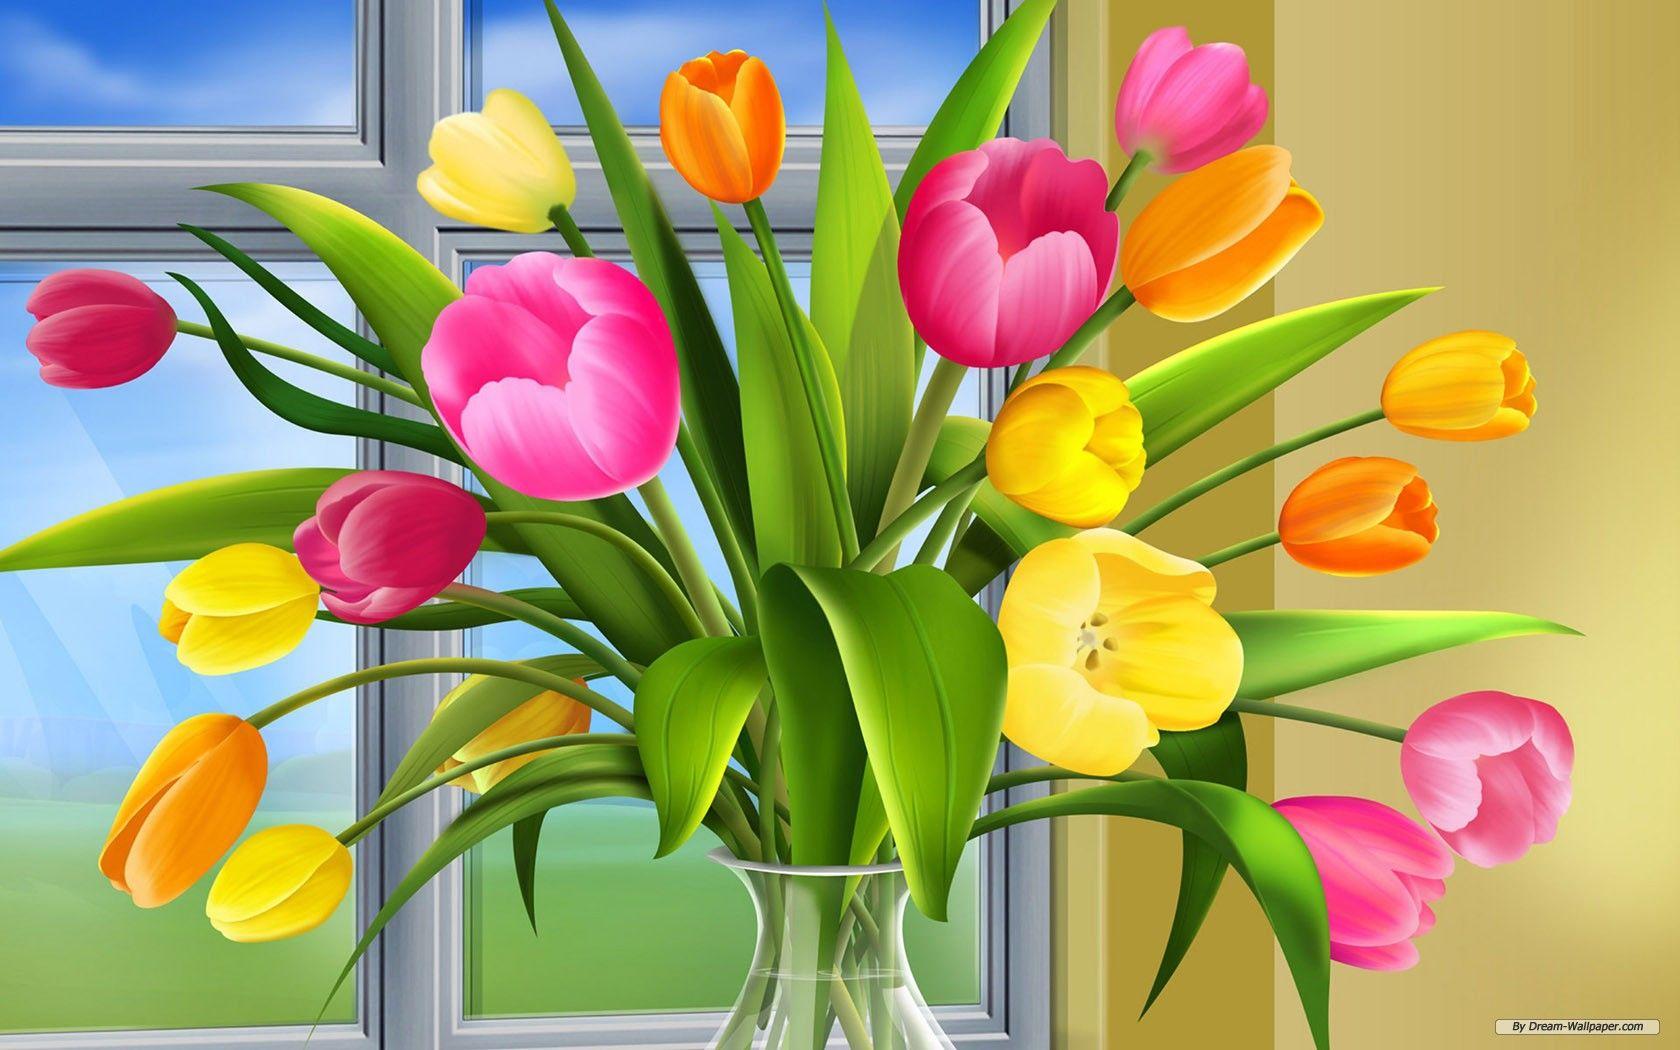 Holiday Flower Wallpaper Tulips In Vase Flower Stamp